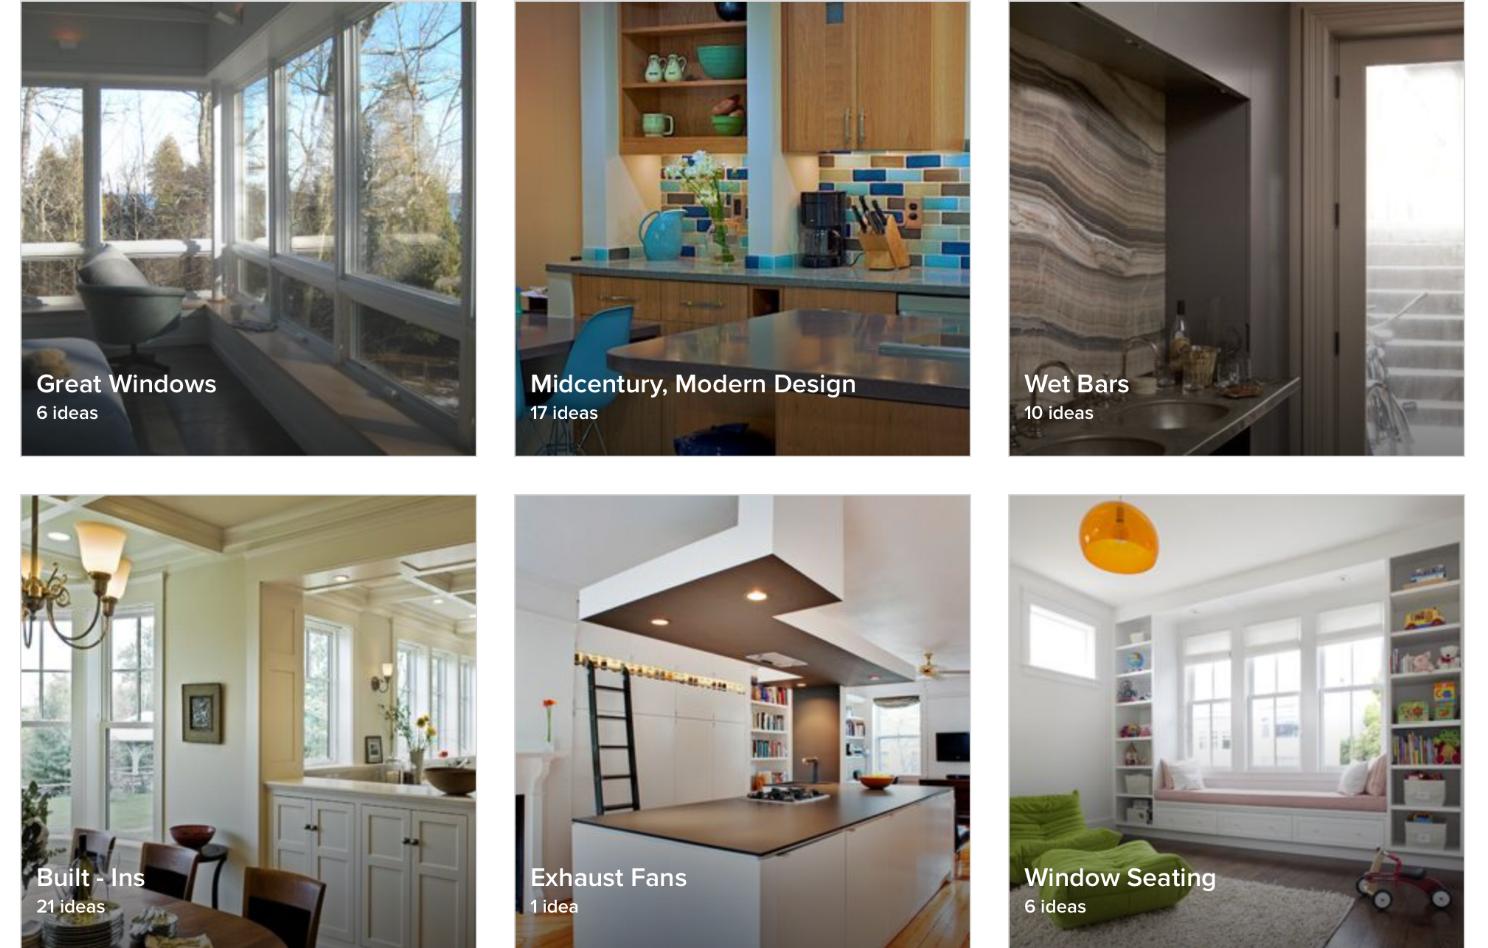 house-ideabooks-design-builders-ann-arbor-mi